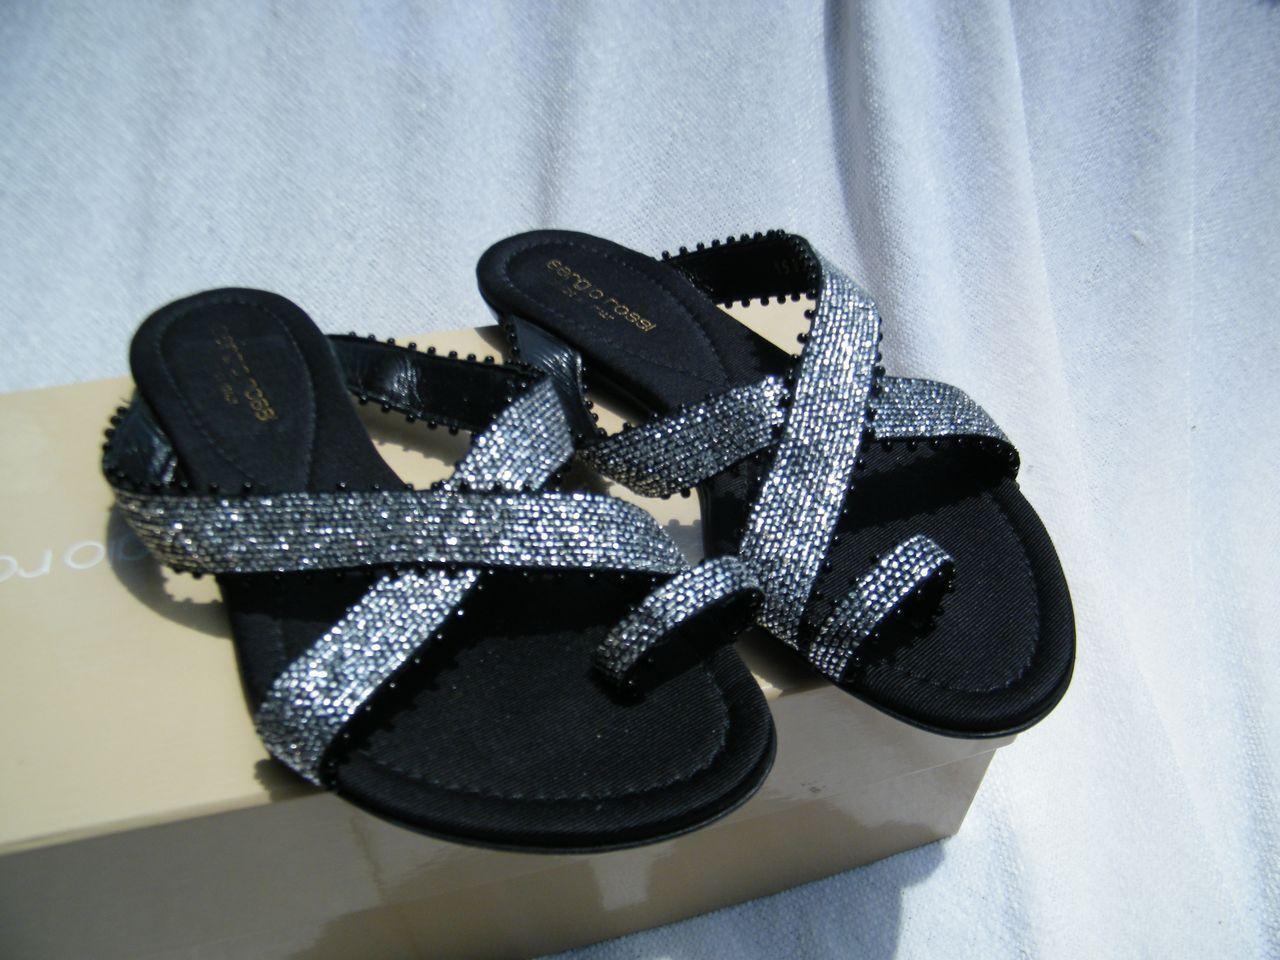 SERGIO ROSSI Schuhe BALLET flats loafers SANDALS schwarz 36.5 6.5